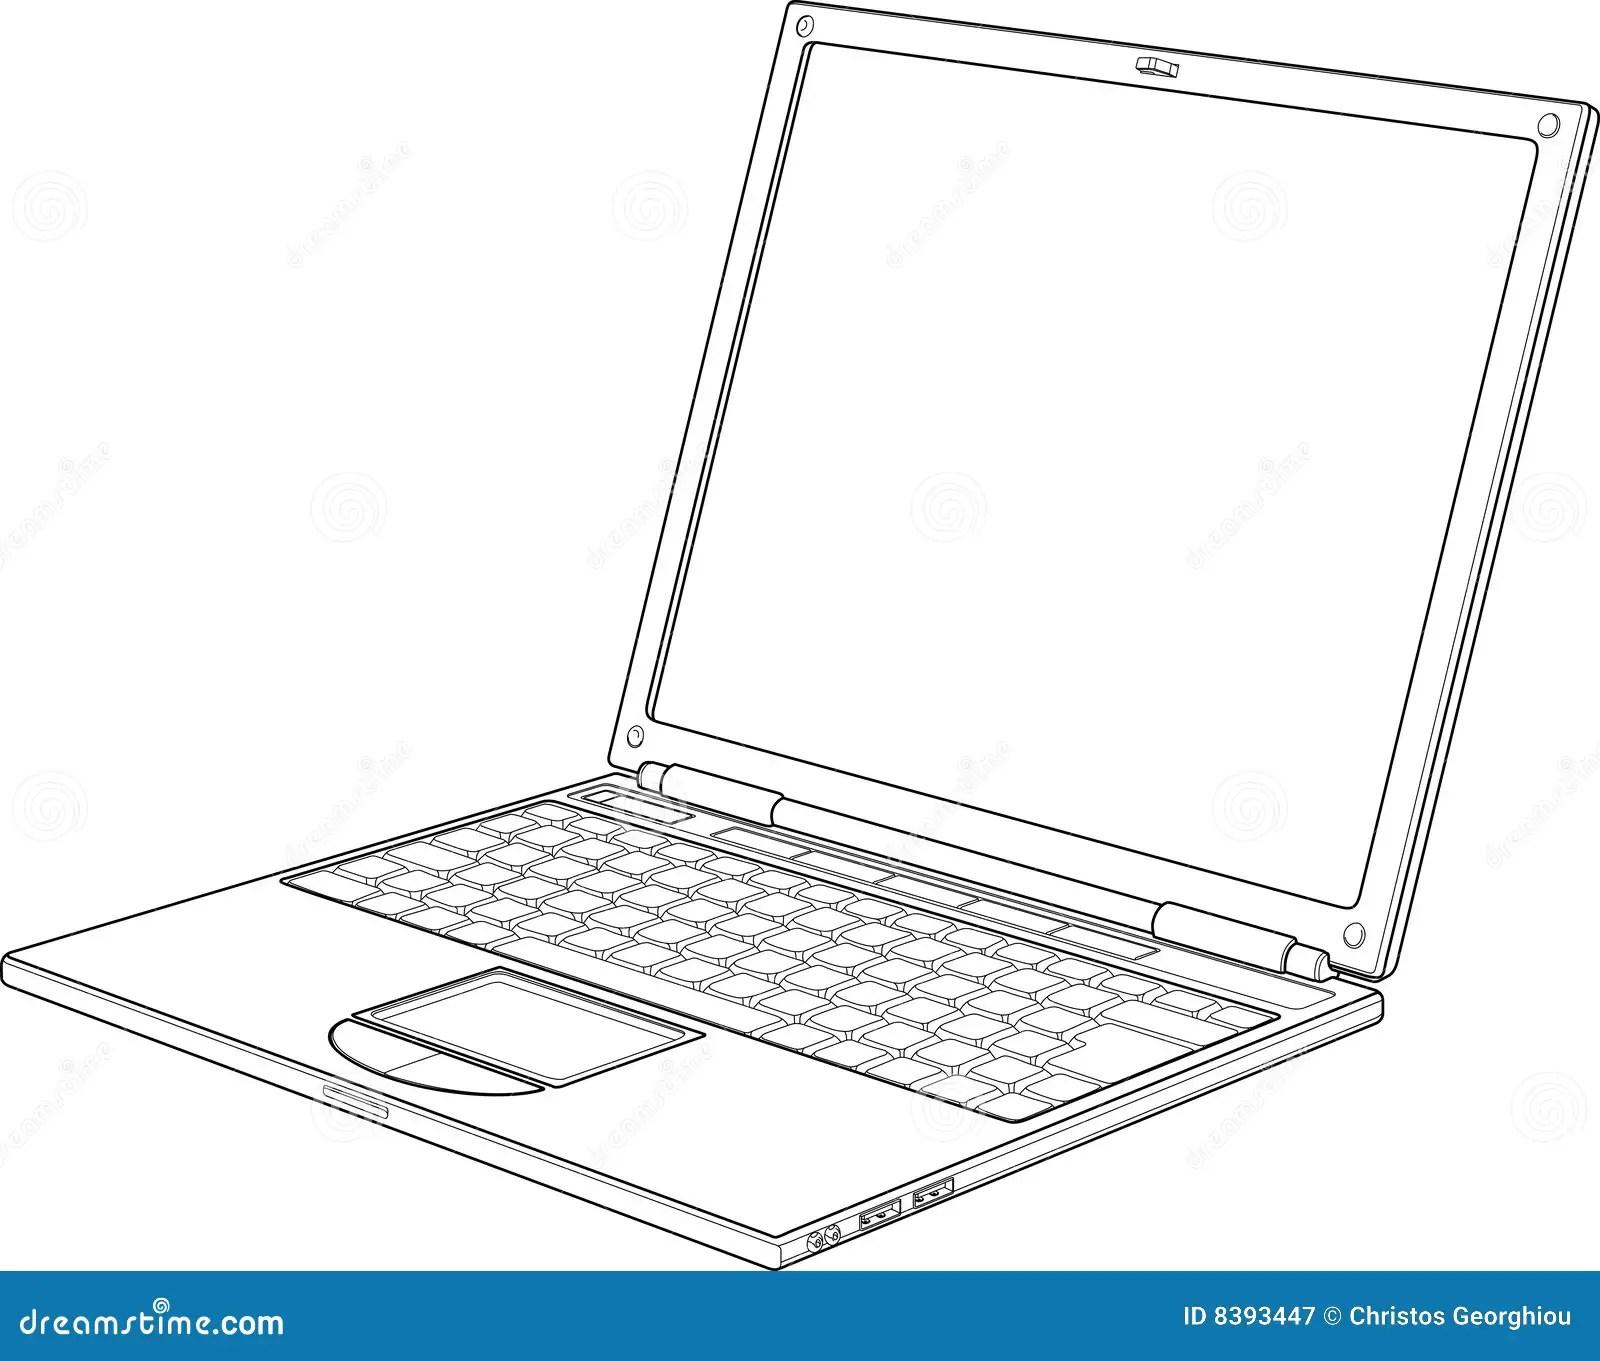 Ilustracion Del Vector Del Esquema De La Computadora